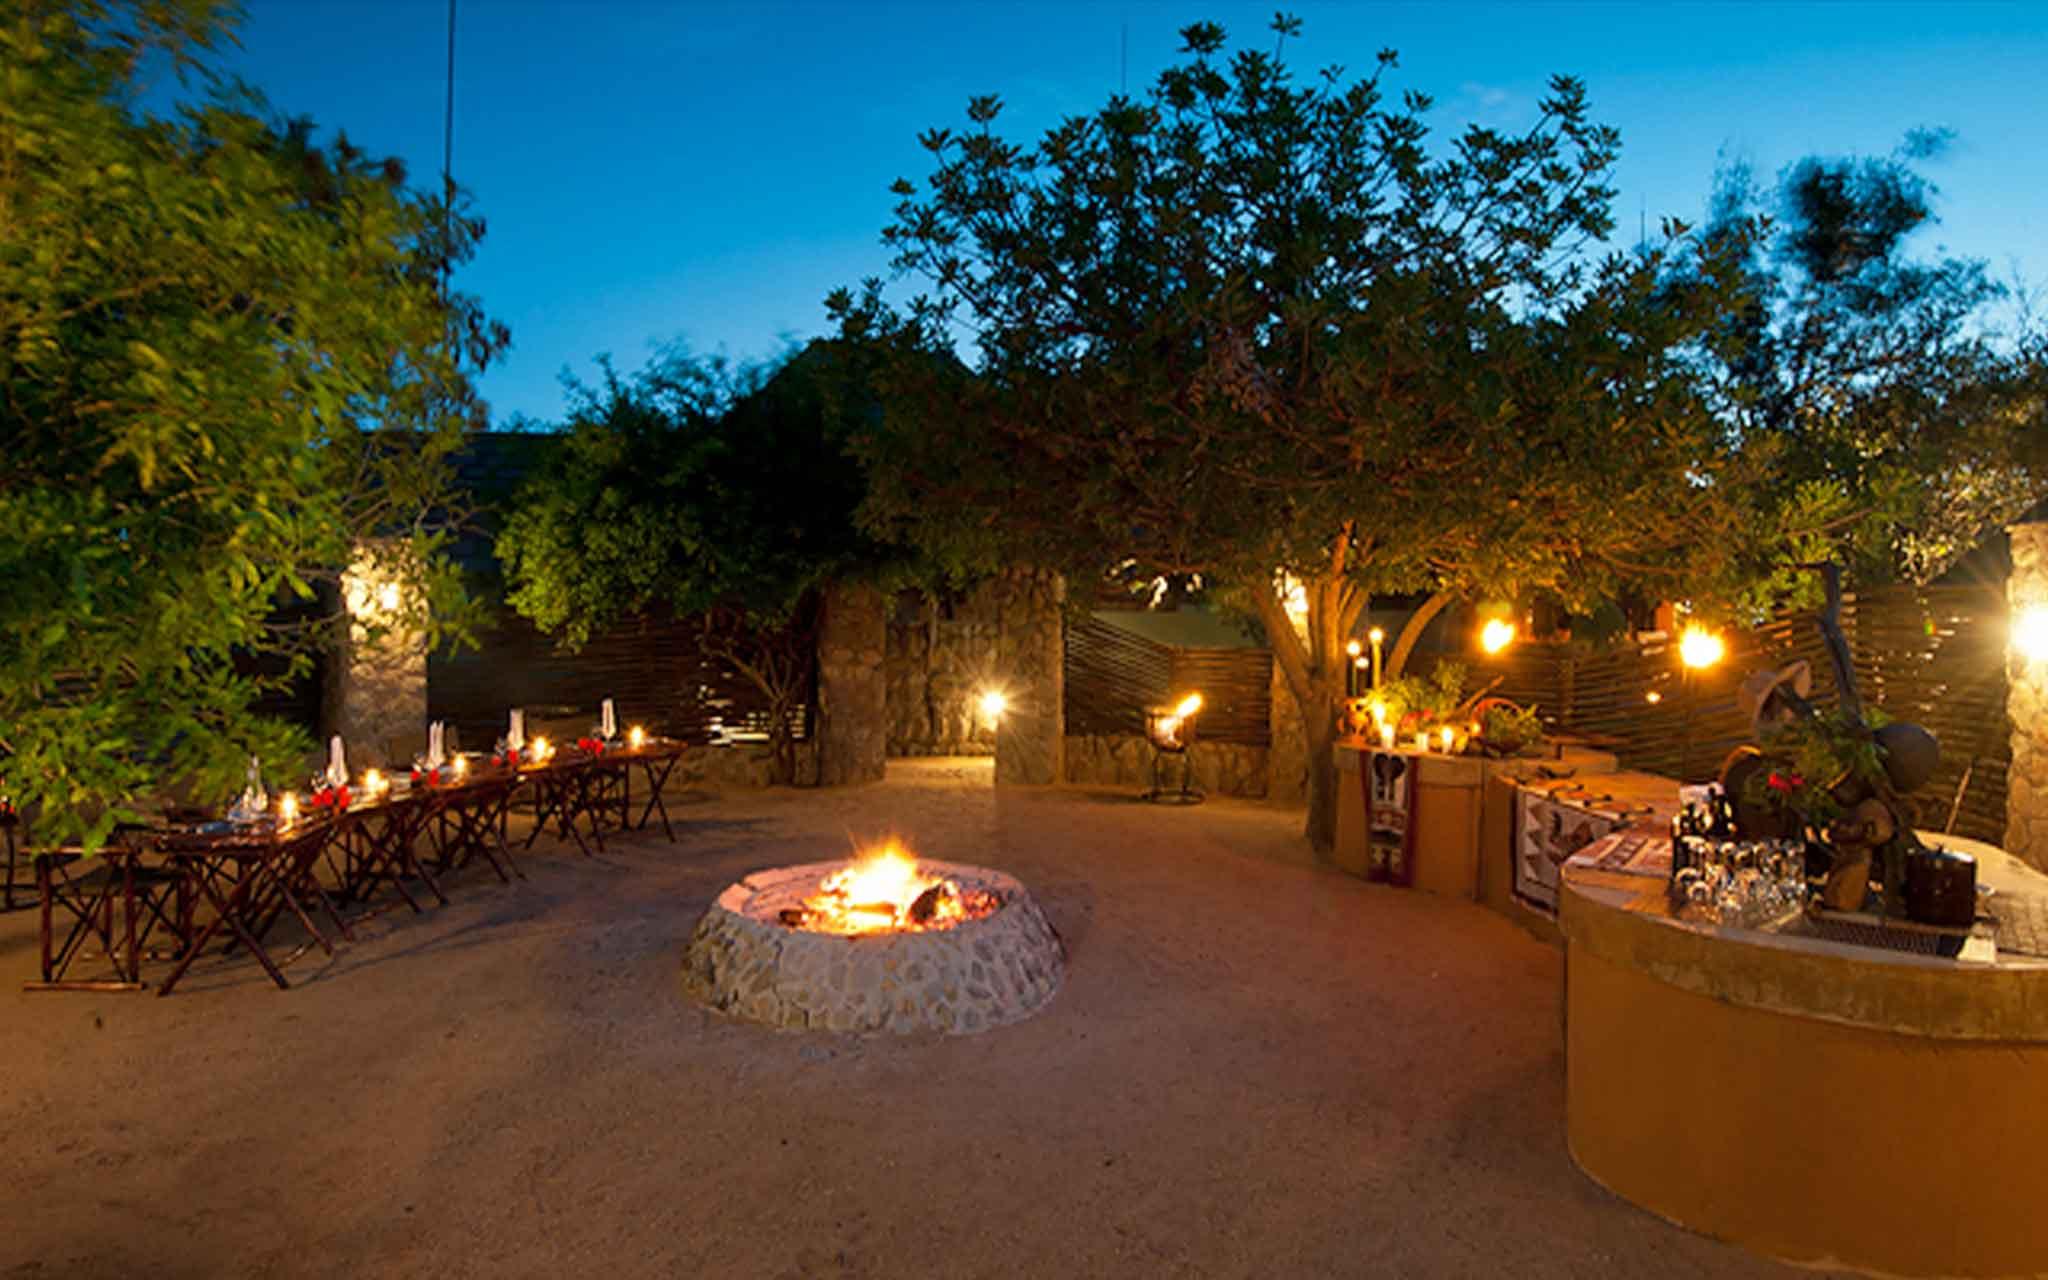 5. Nzumba Lodge